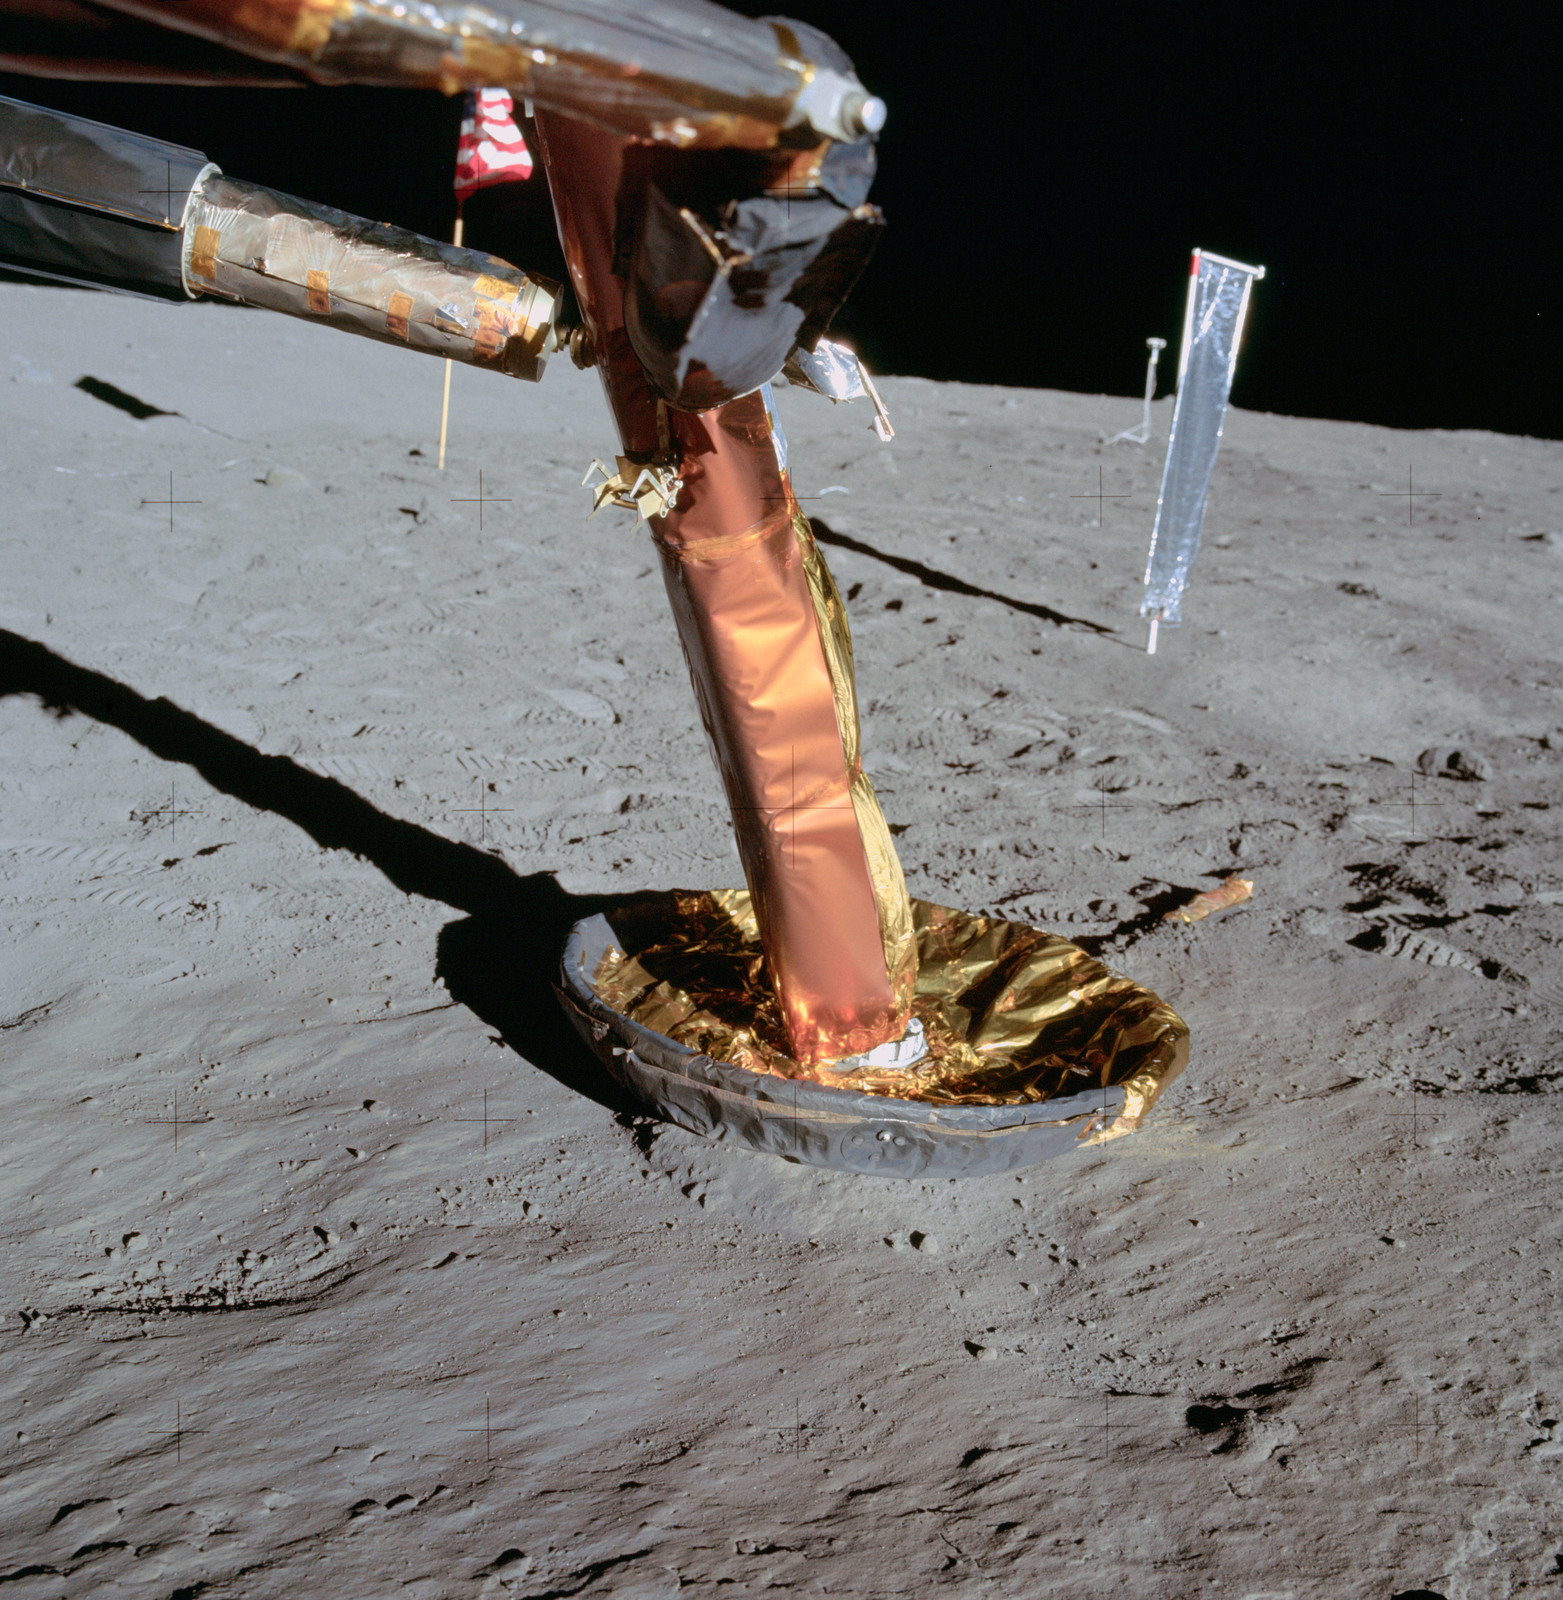 AS11-40-5920 - Apollo 11 - Apollo 11 Mission image - Lunar Module +y footpad and contact prob